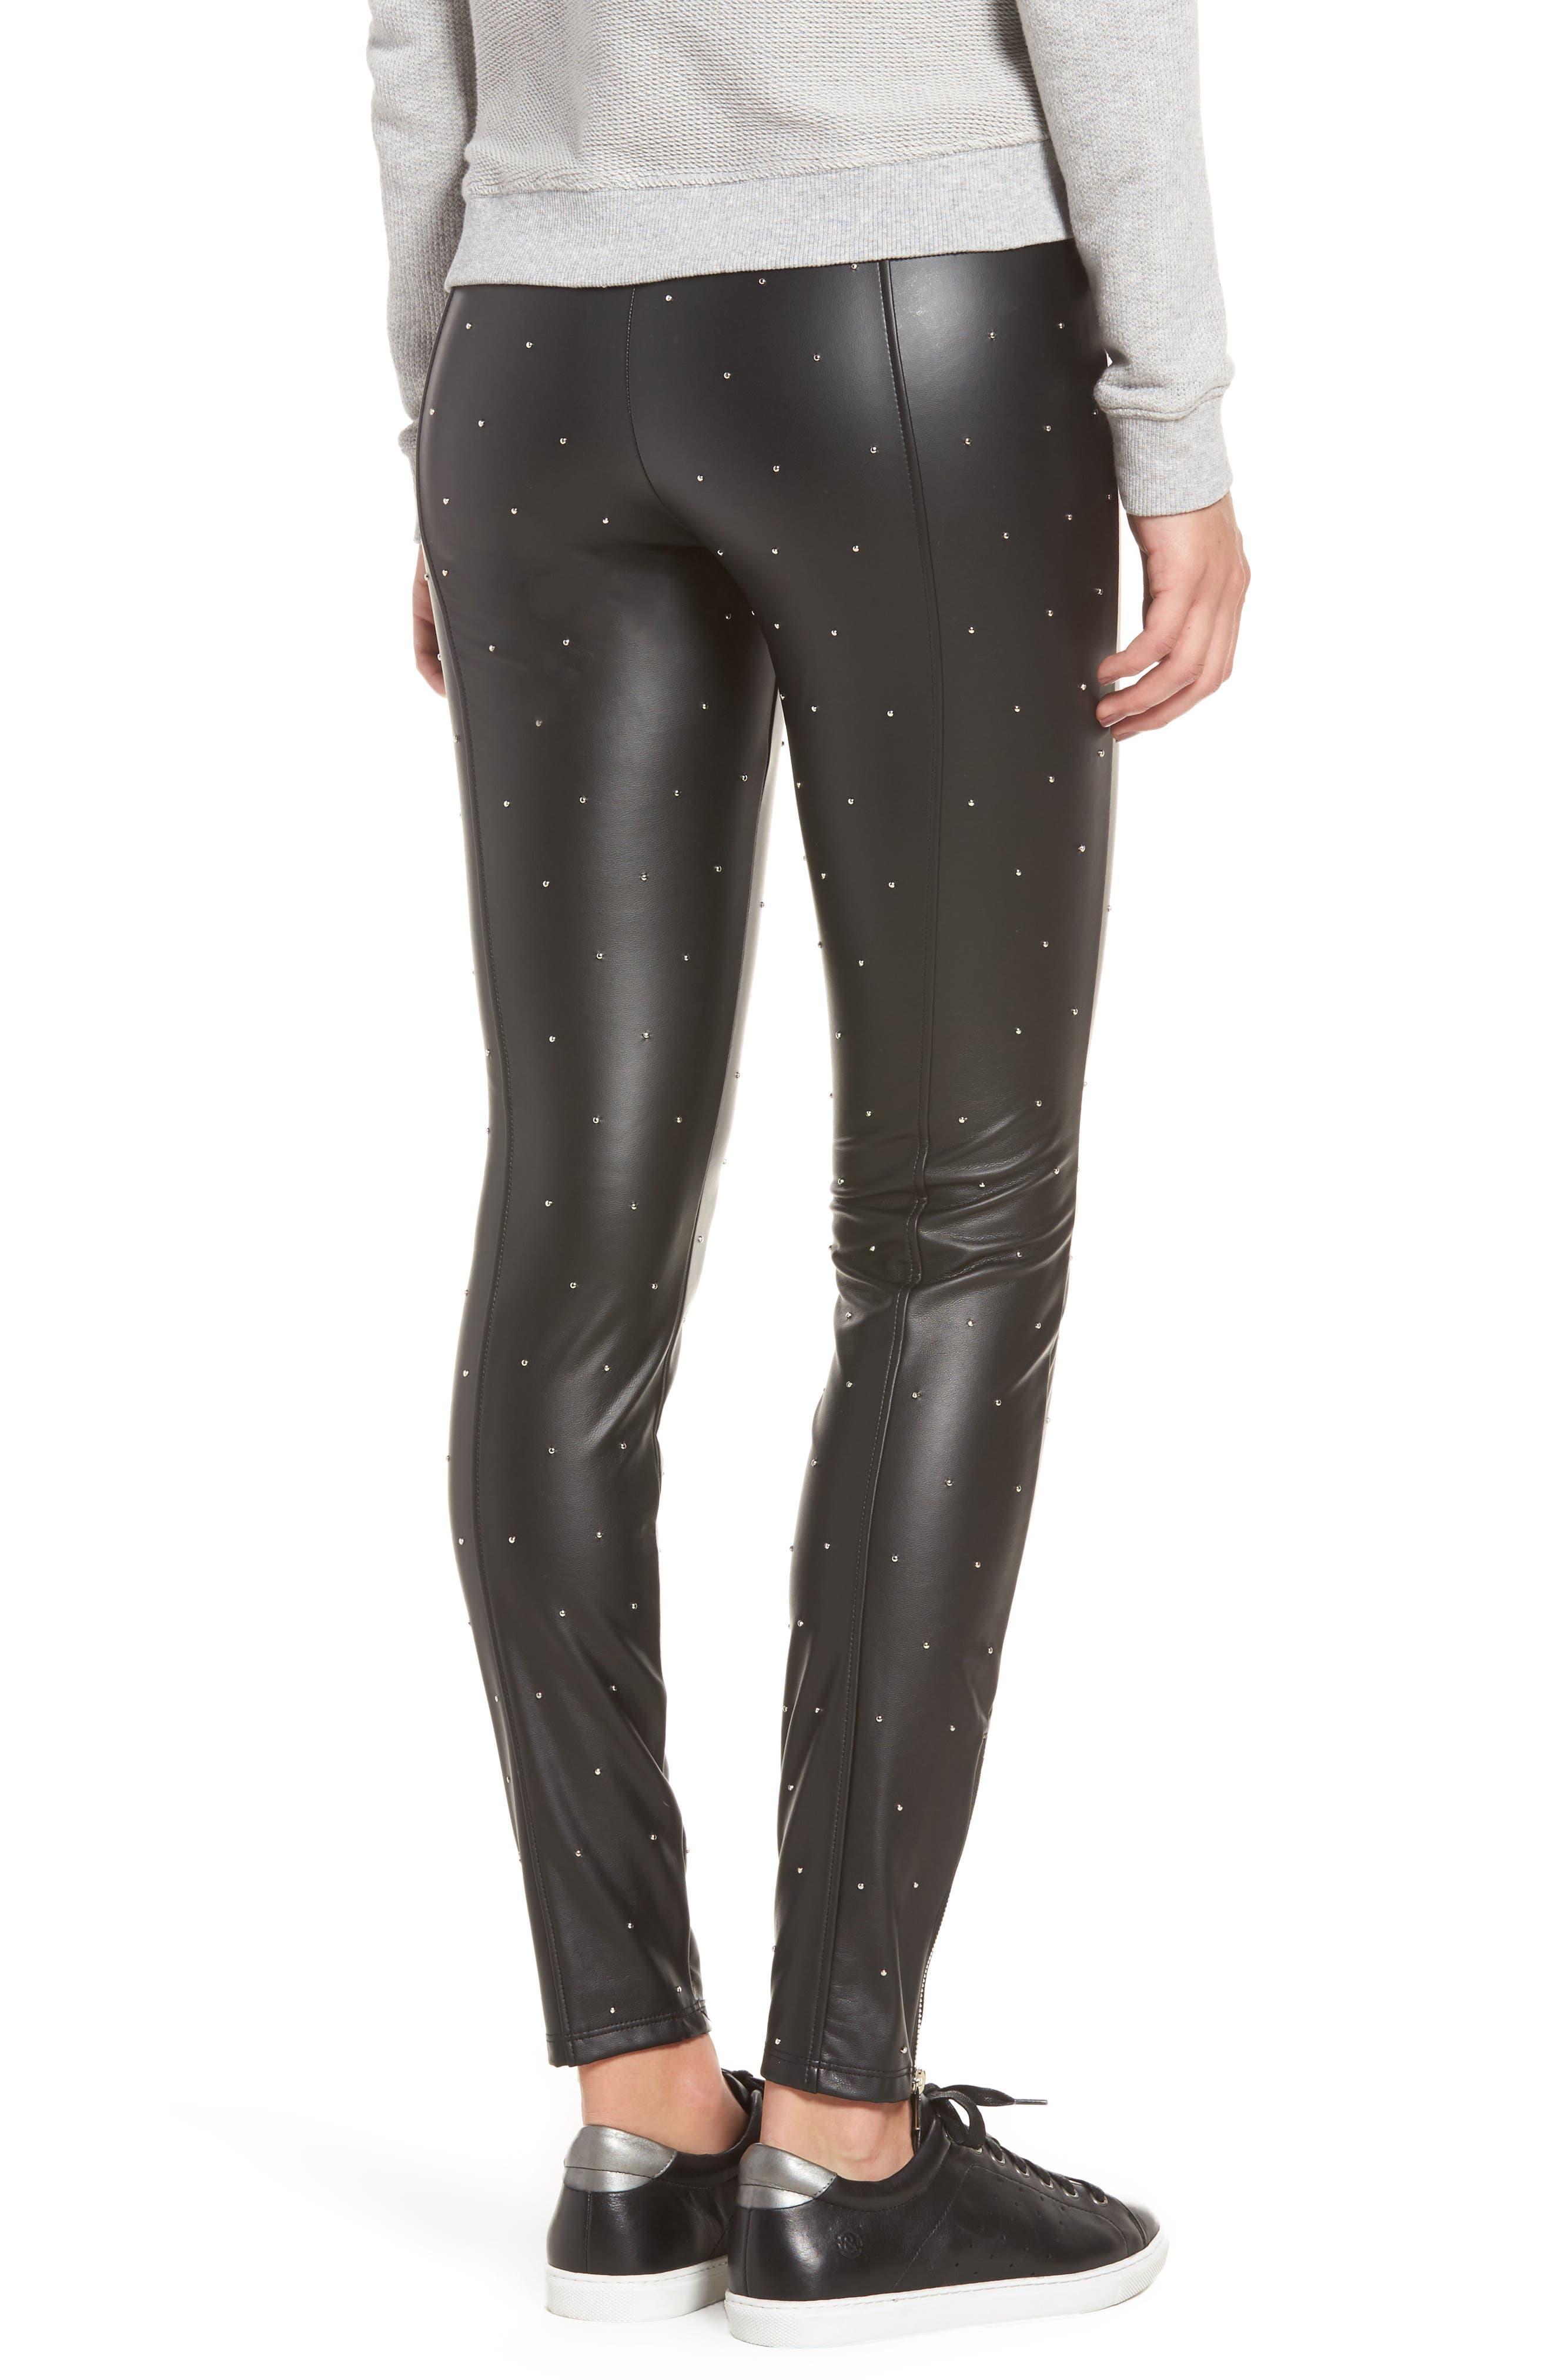 Bowery Studded High Waist Leggings,                             Alternate thumbnail 2, color,                             Silver Dot